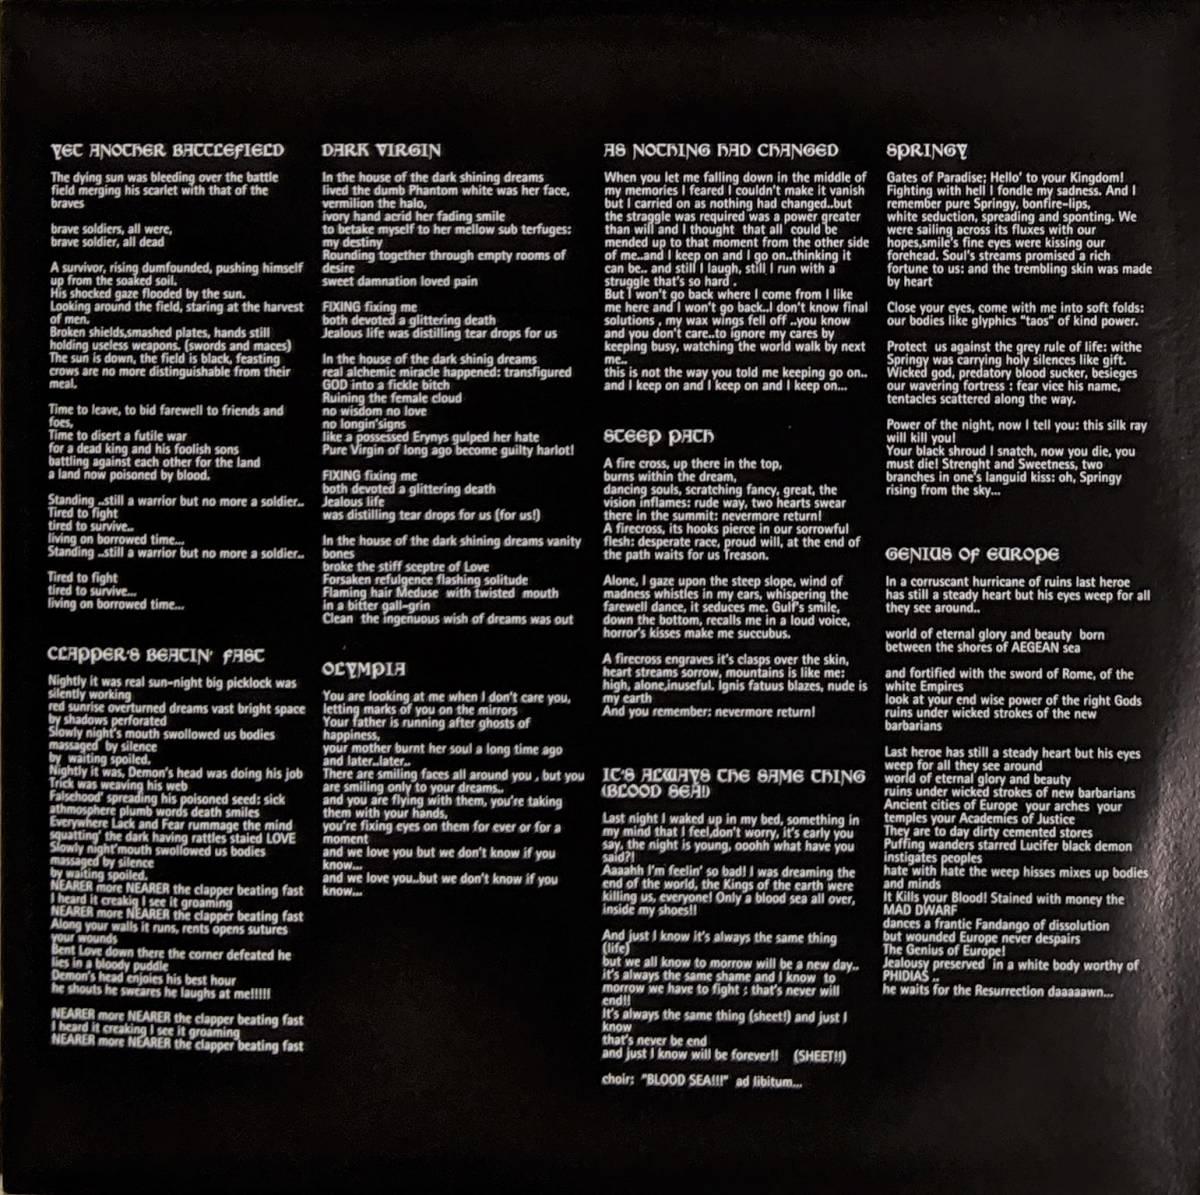 Goad - In The House Of The Dark Shining Dreams 限定二枚組アナログ・レコード